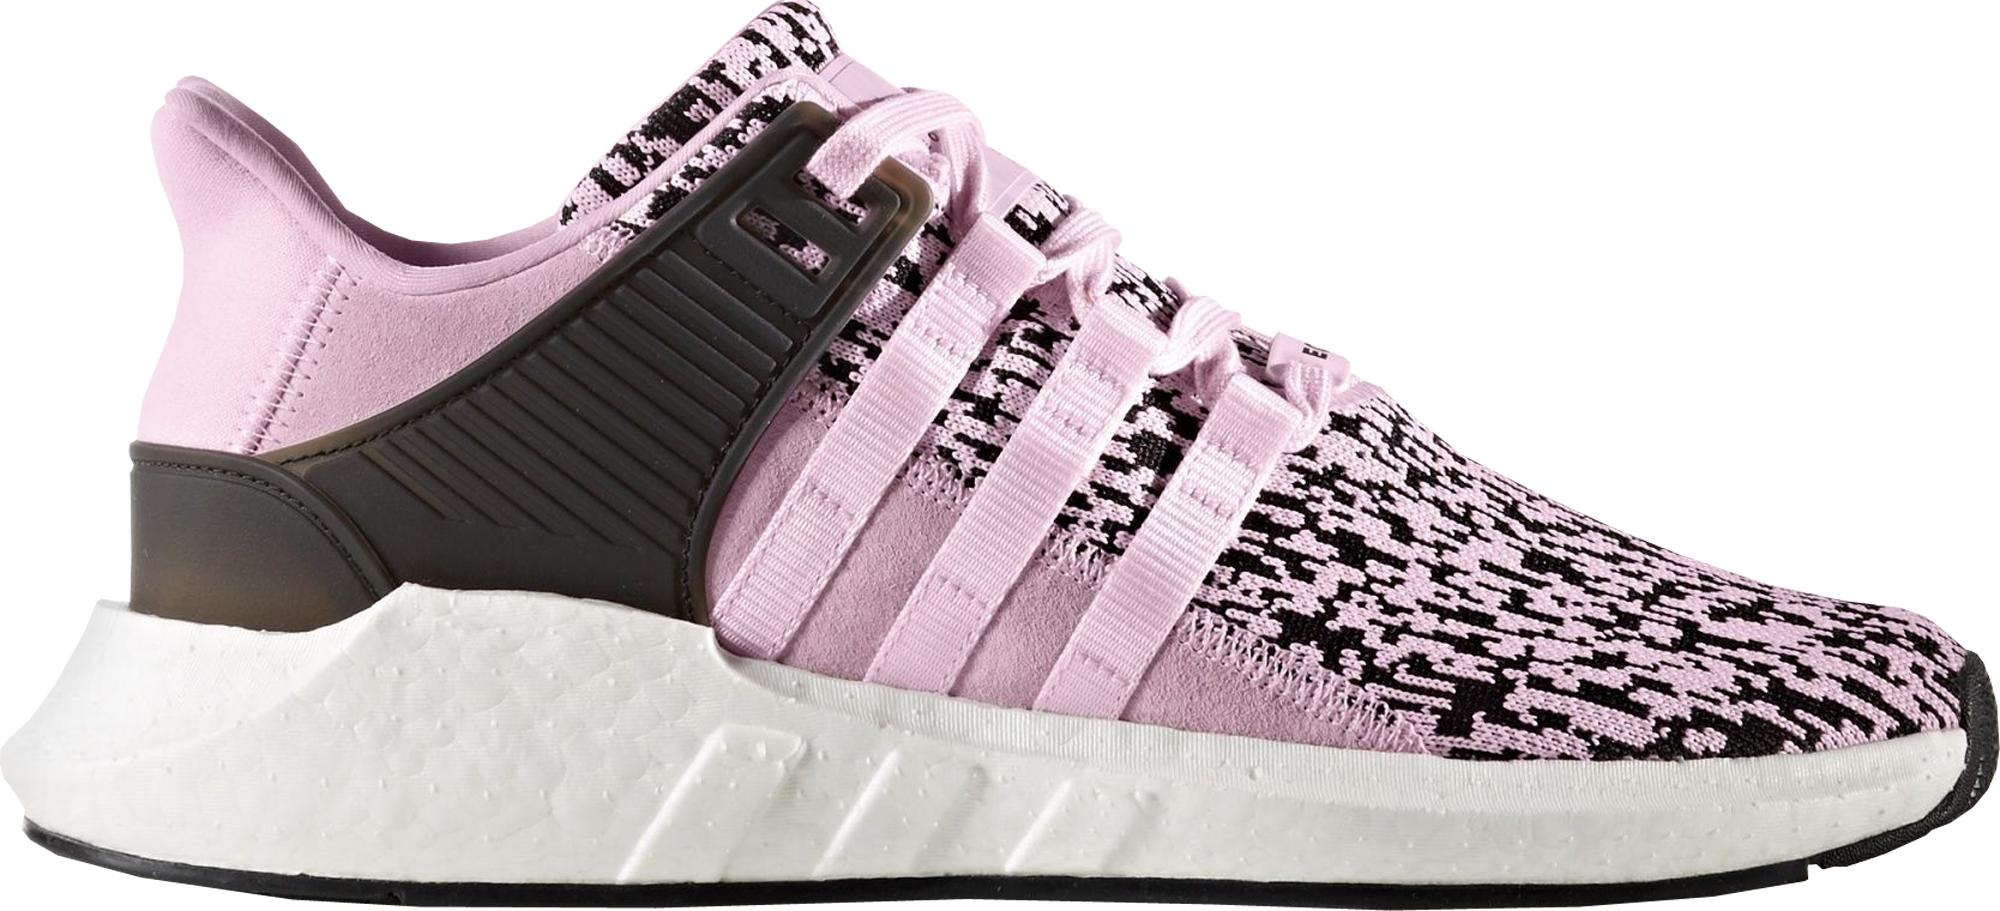 adidas EQT Support 93/17 Glitch Pink Black